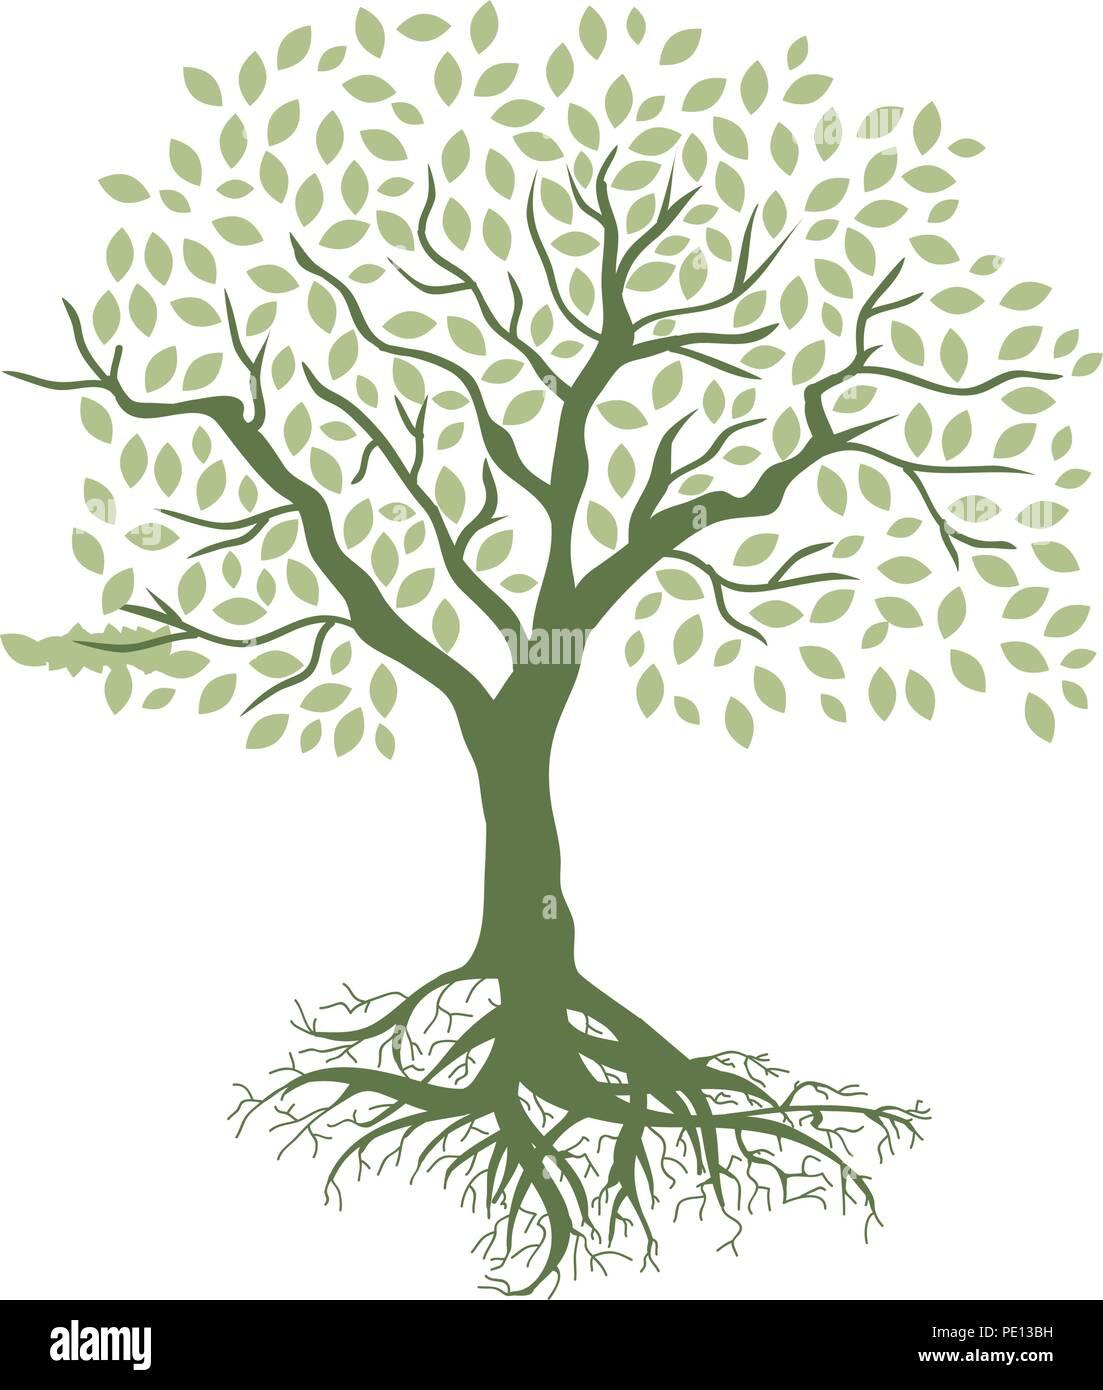 tree of life stock vector art illustration vector image